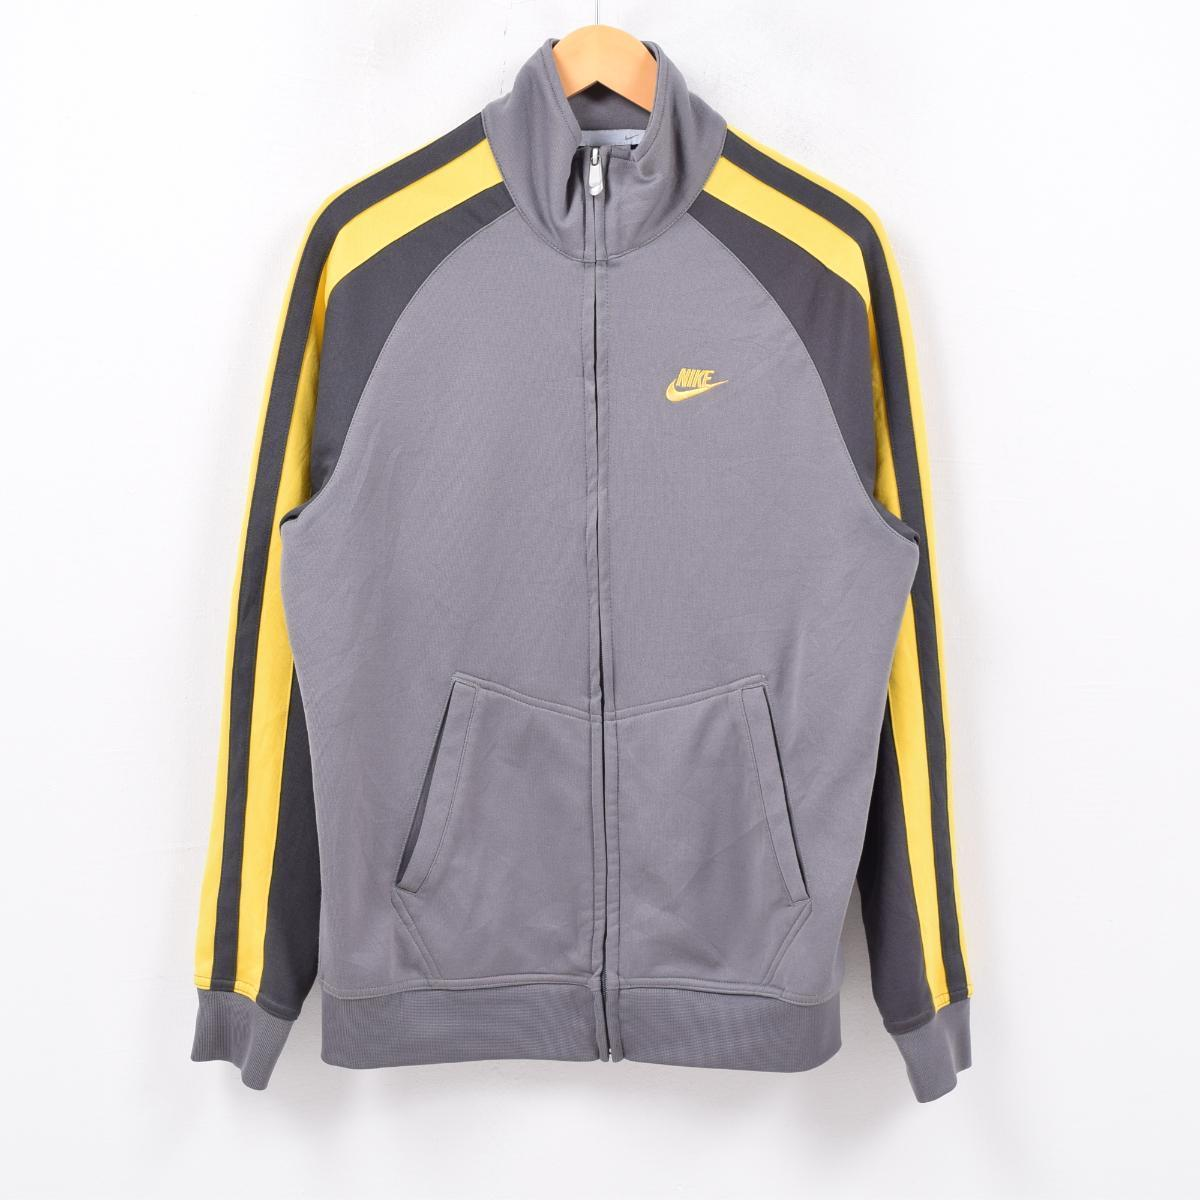 47acffdb53e3 VINTAGE CLOTHING JAM  Nike NIKE jersey truck jacket men M  wbc4721 ...